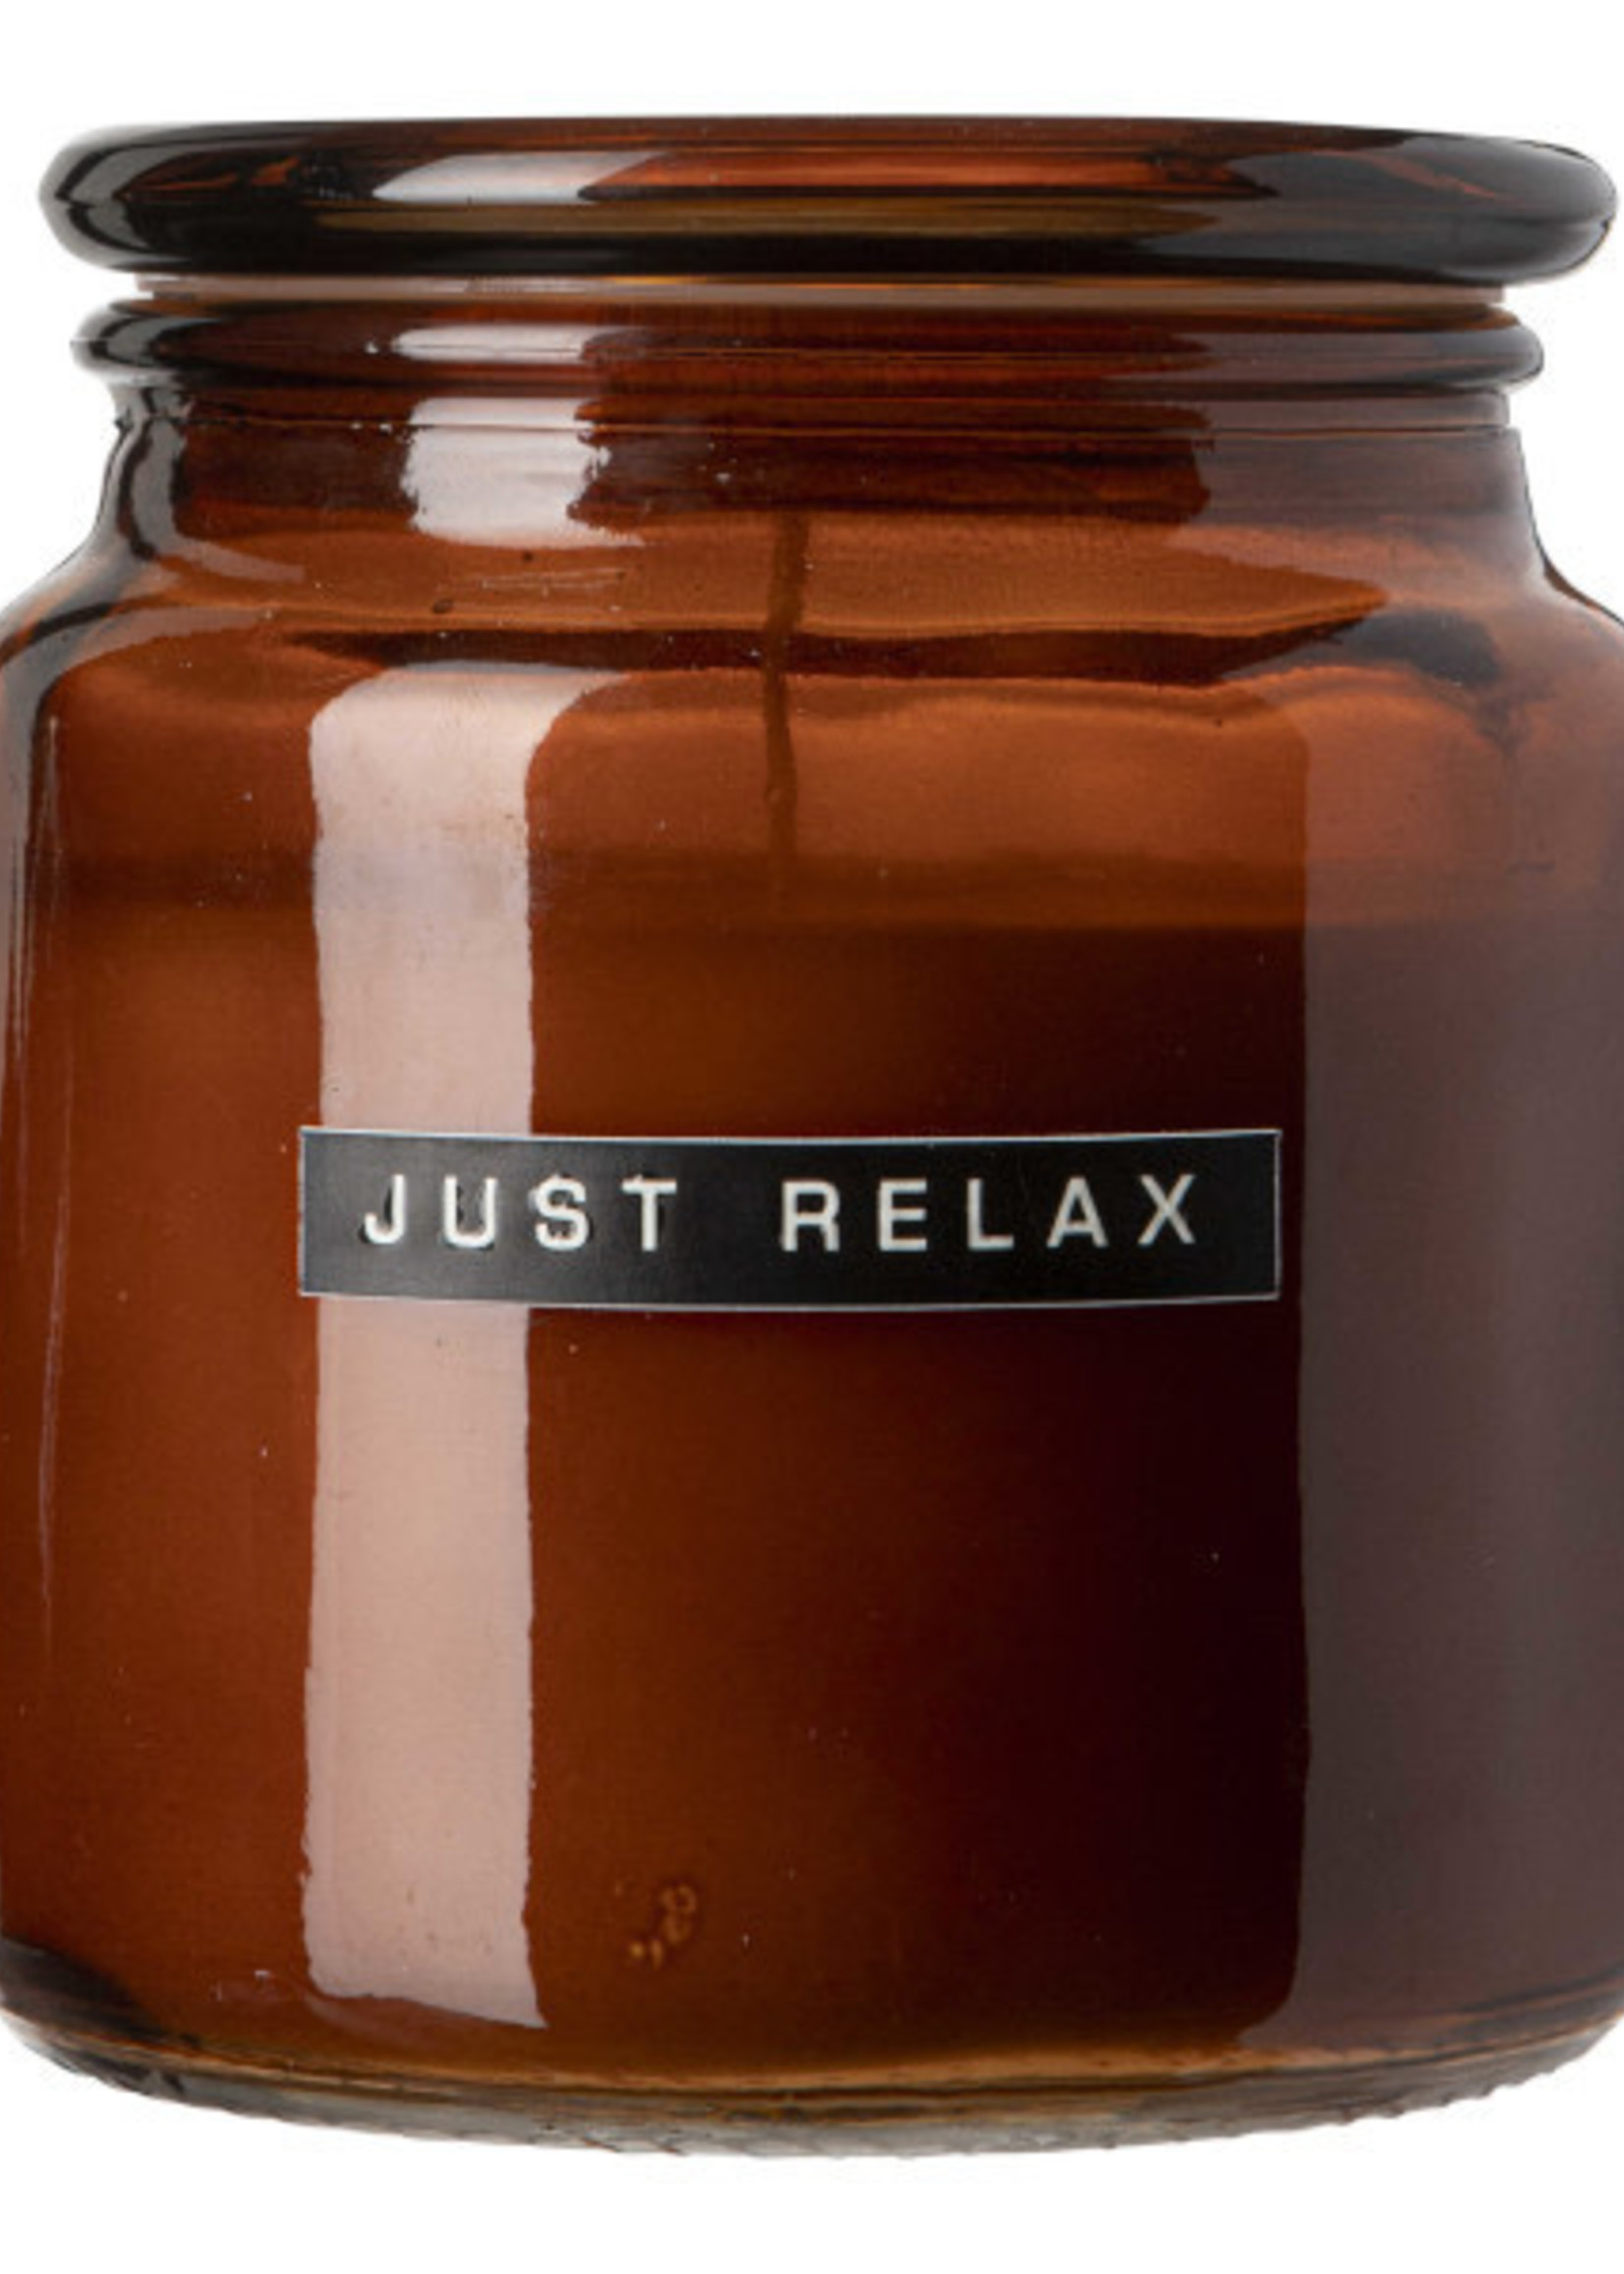 WELLmark WELLmark - Grote geurkaars cedarwood bruin - glas 'just relax'